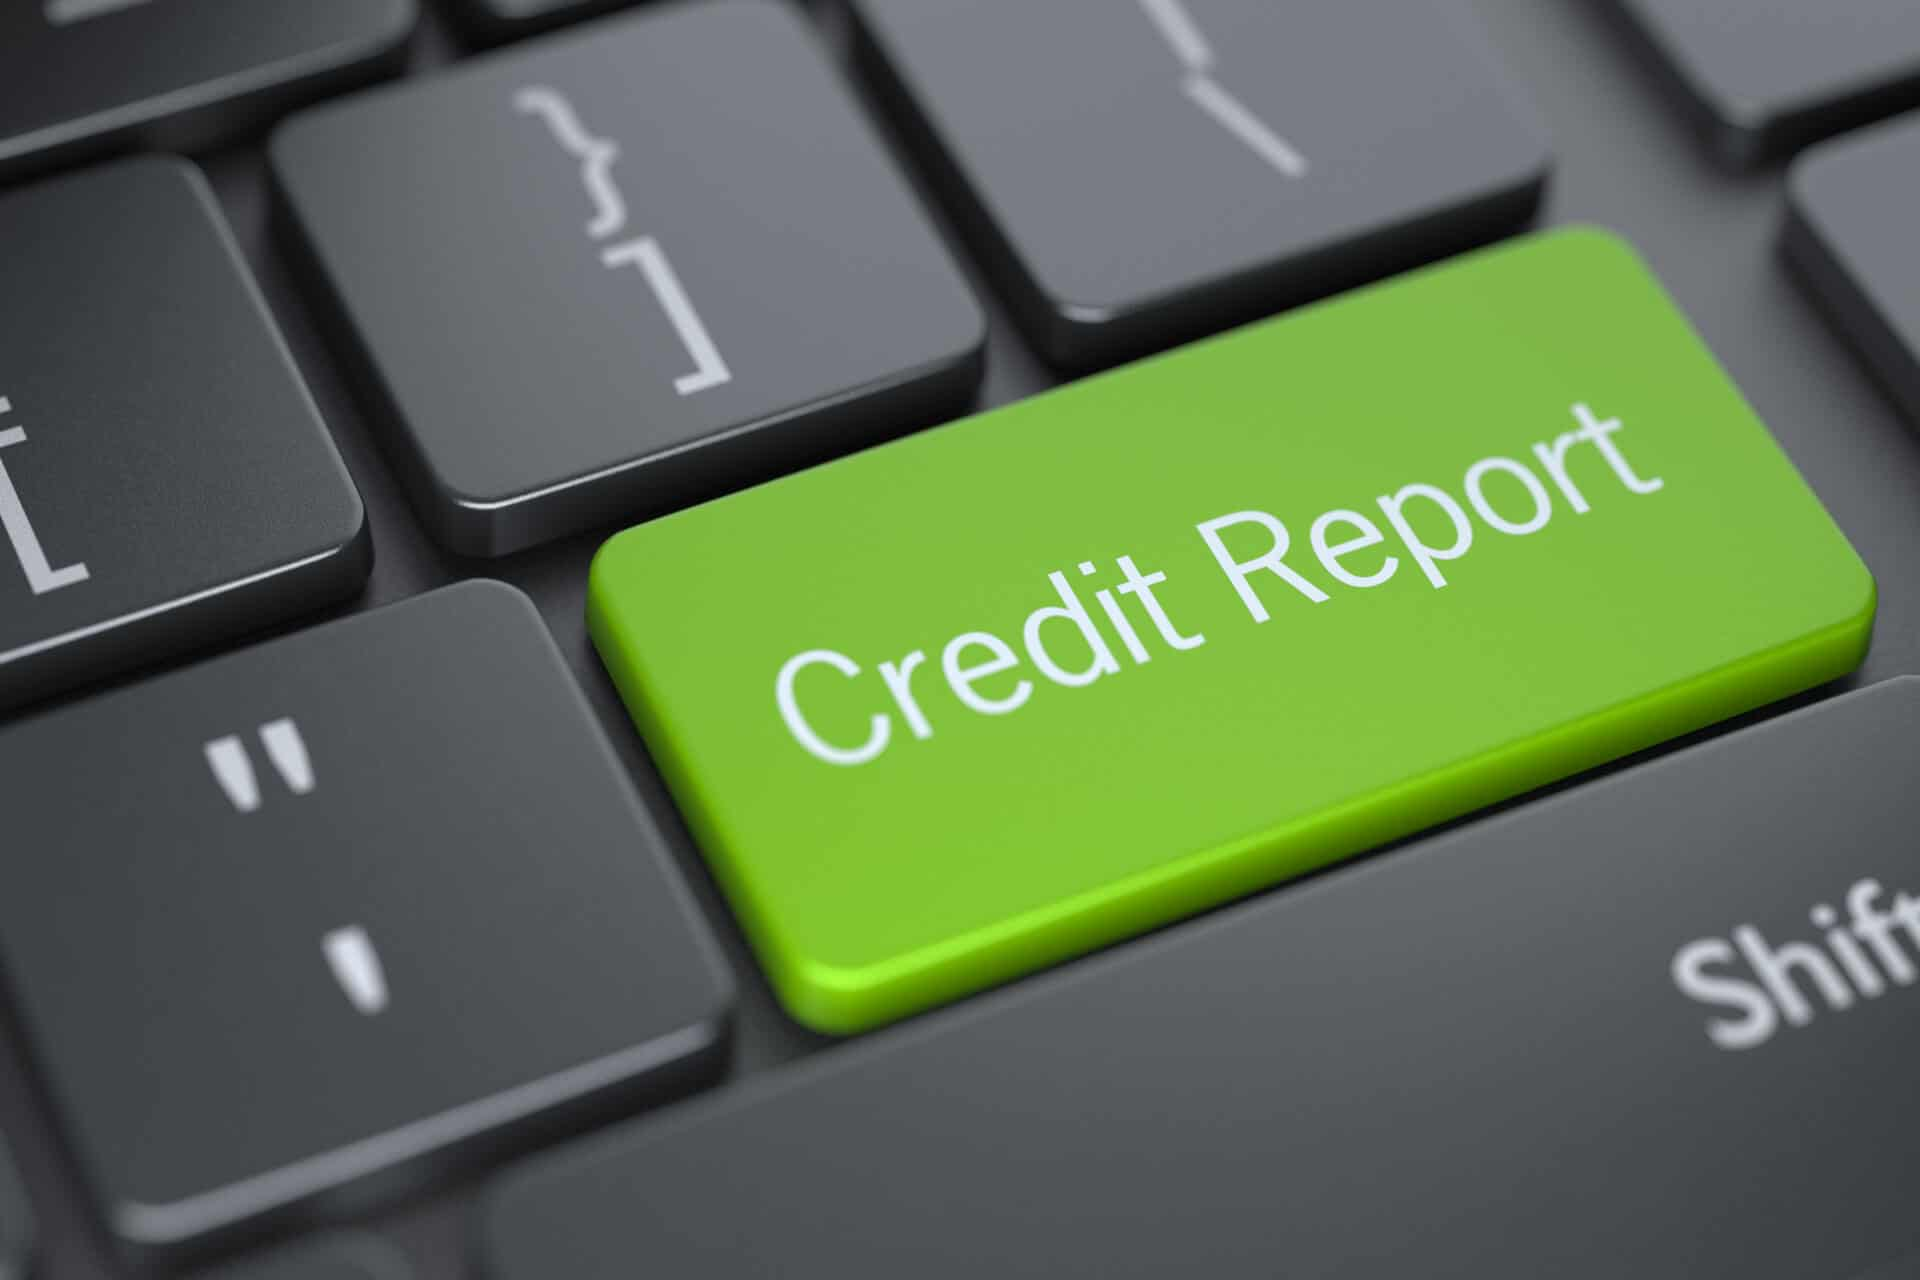 credit report green keyboard key